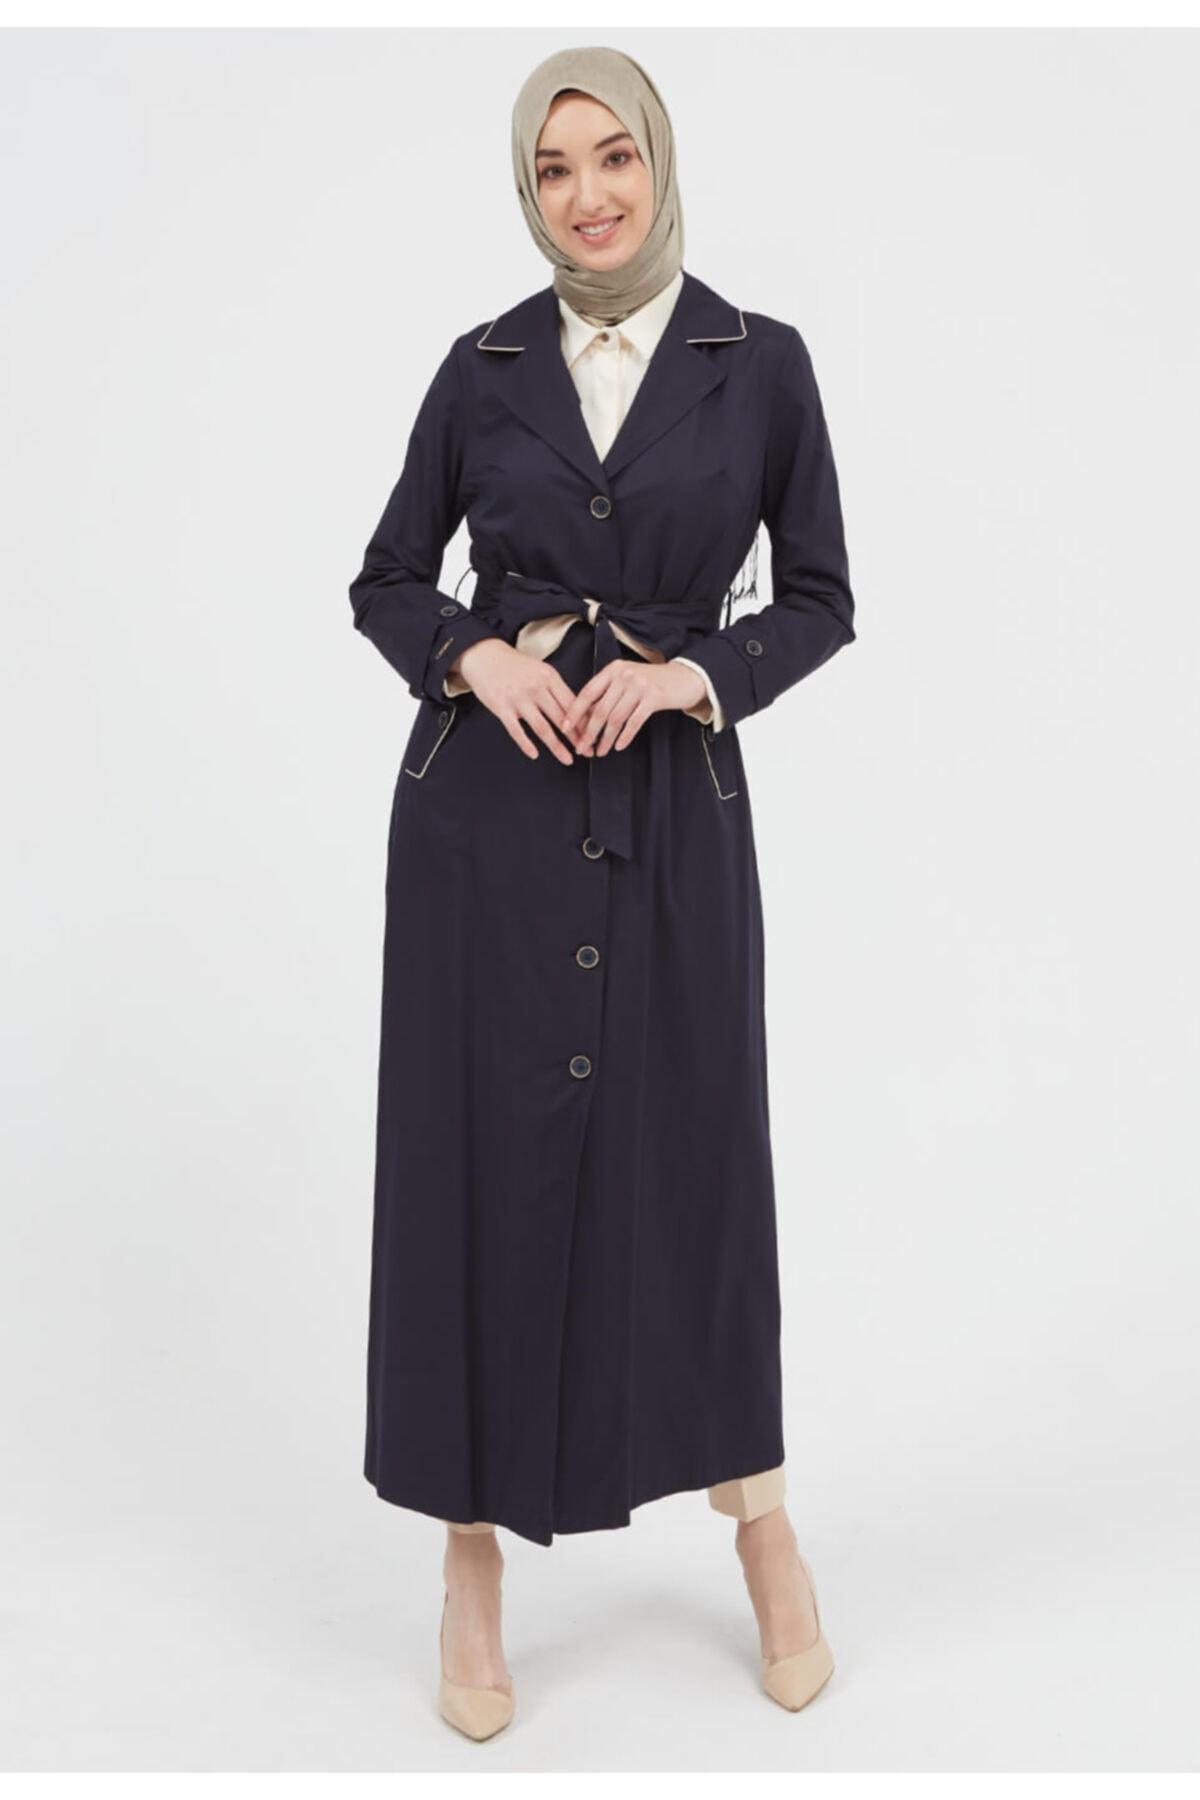 مانتو زنانه ارزان برند Setrms رنگ لاجوردی کد ty41483852